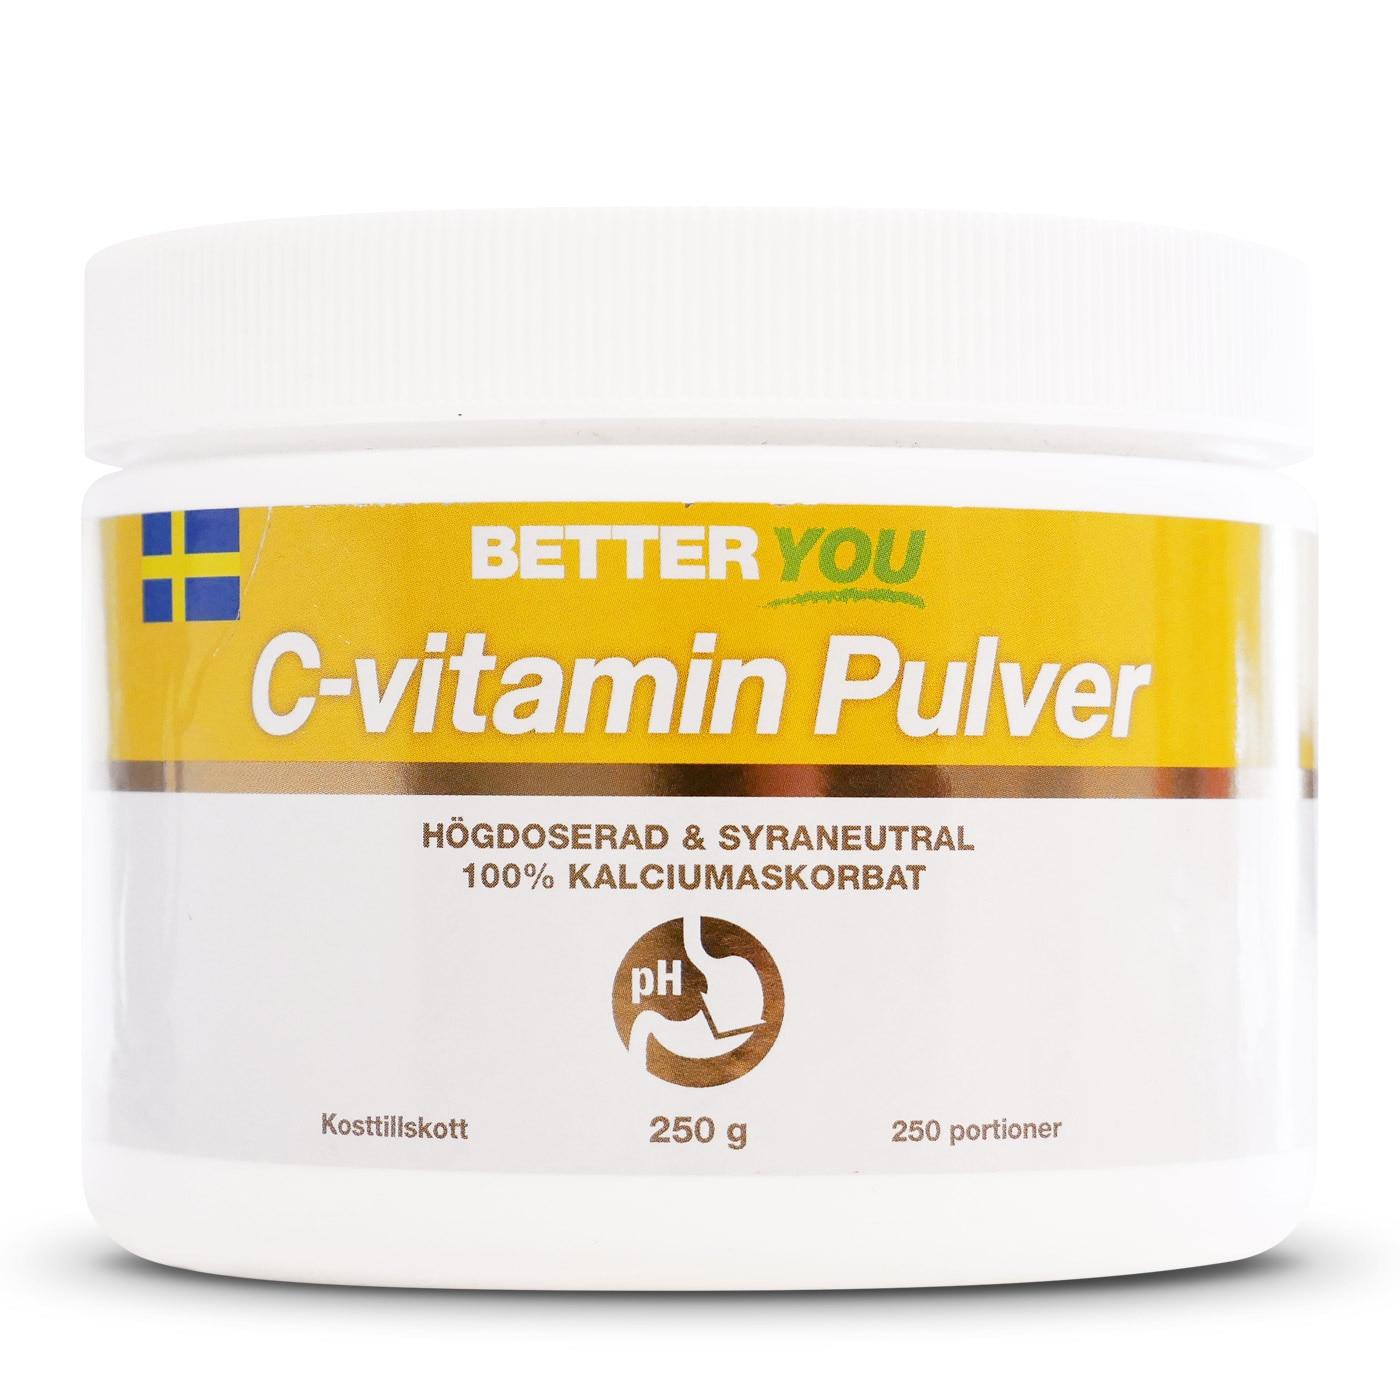 C-vitamin Pulver - 250 g